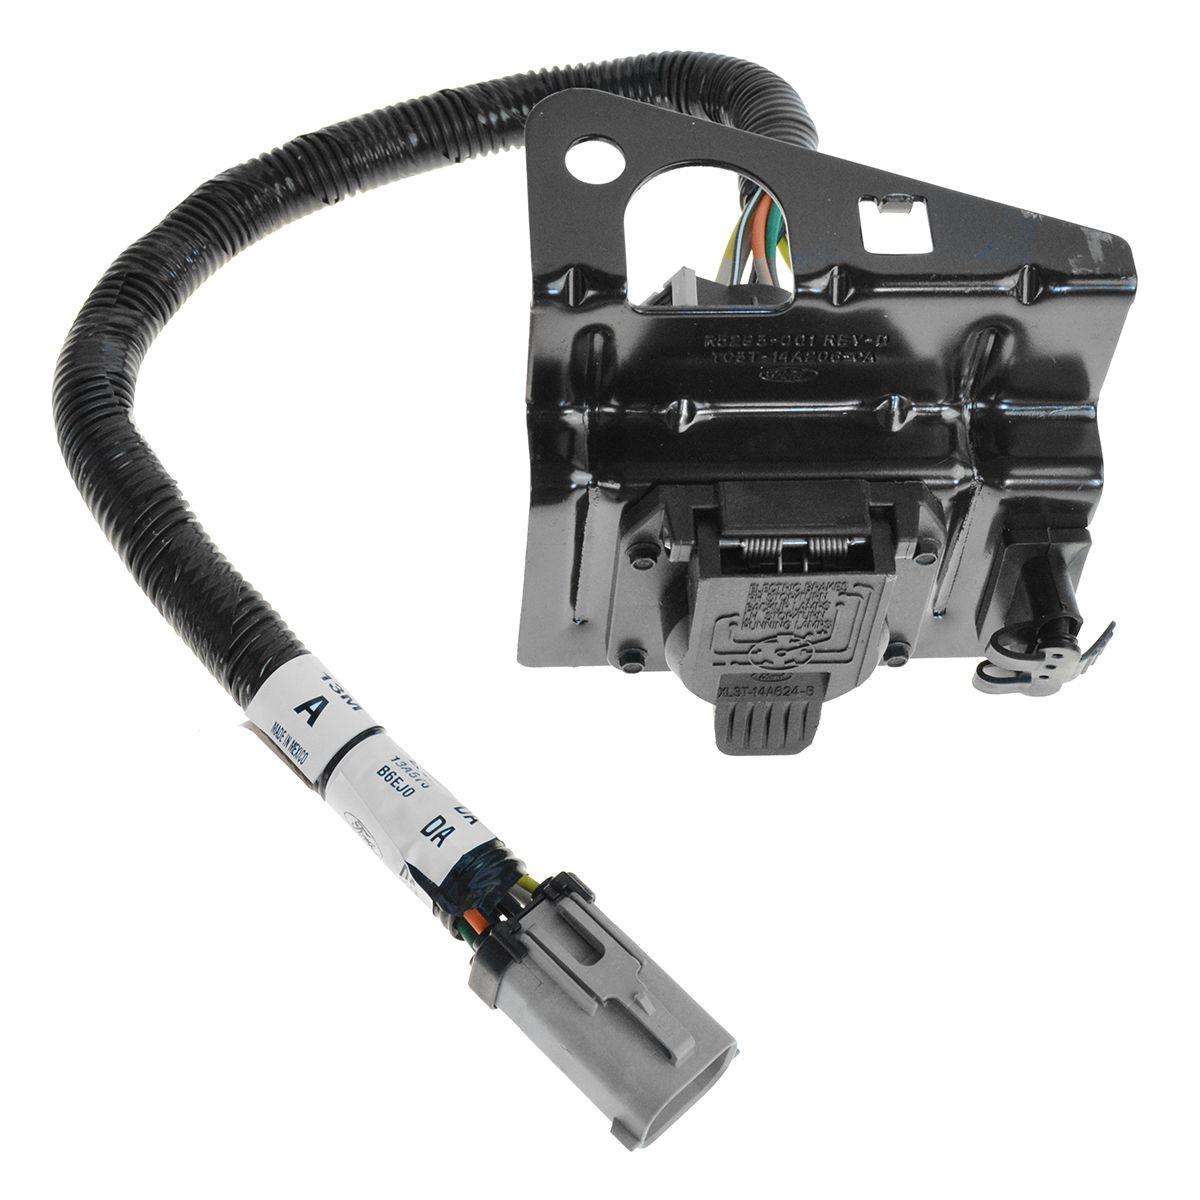 FORD 4 7 Pin Trailer Tow Wiring Harness W Plug Bracket